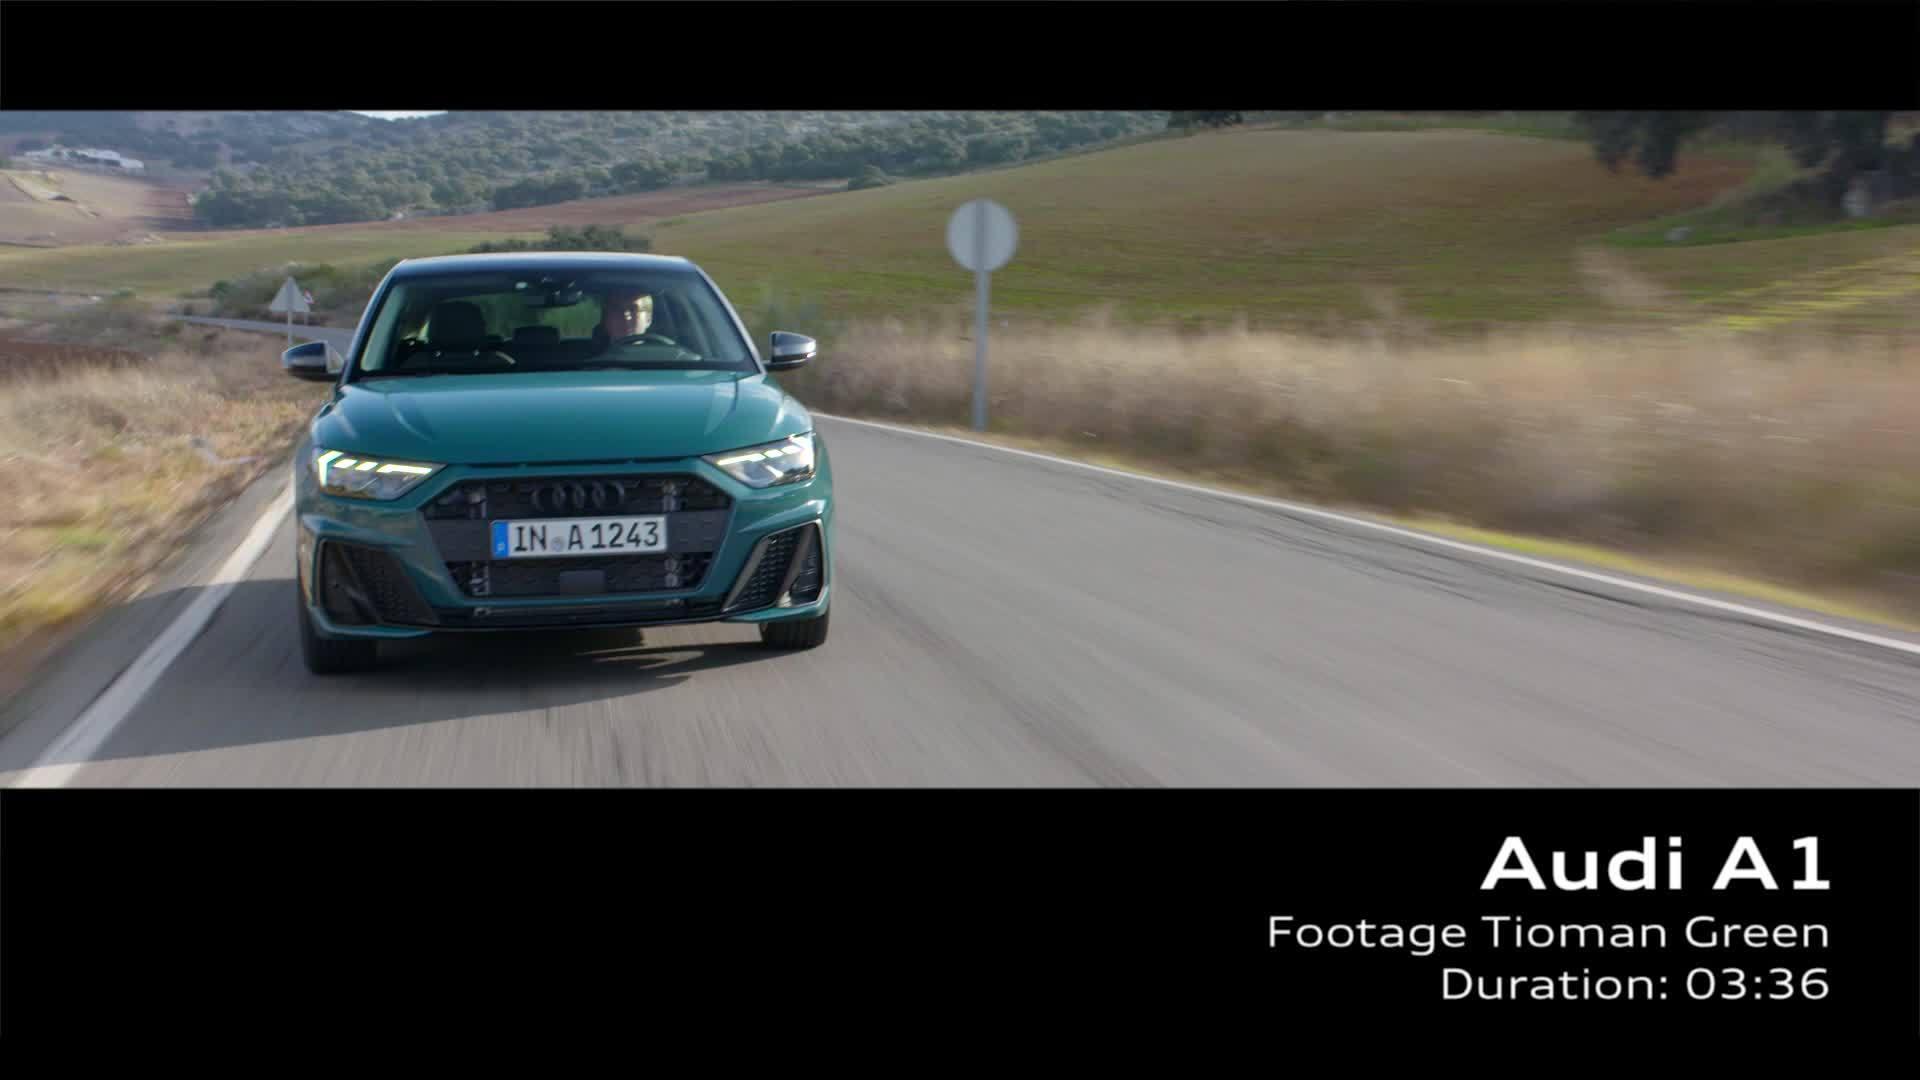 Audi A1 Footage Tioman Green (2018)